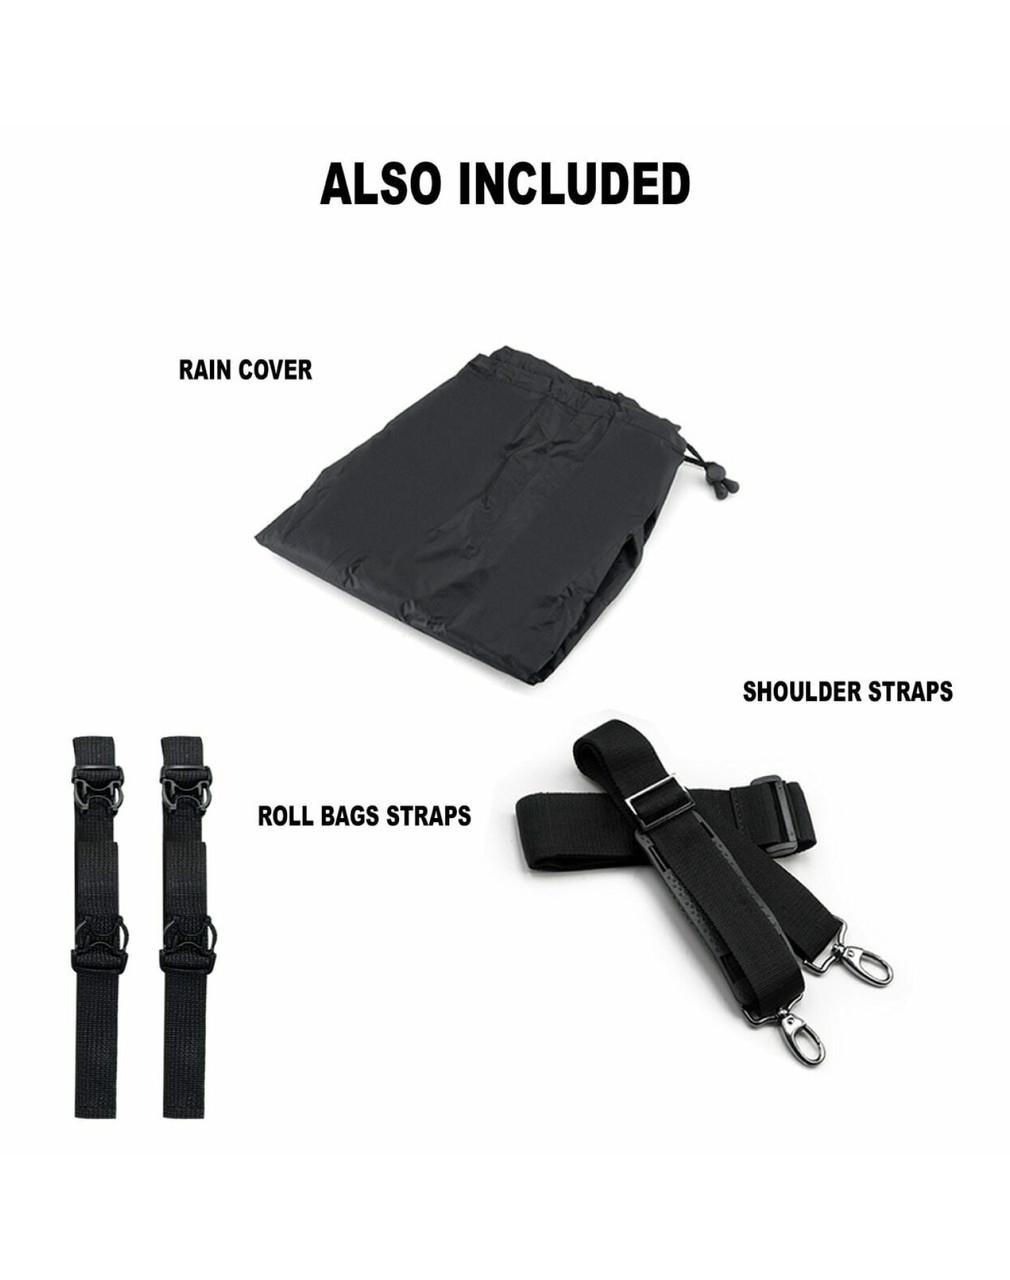 Harley Davidson Viking Aero Medium Expandable Motorcycle Sissy Bar Bags Strap Set